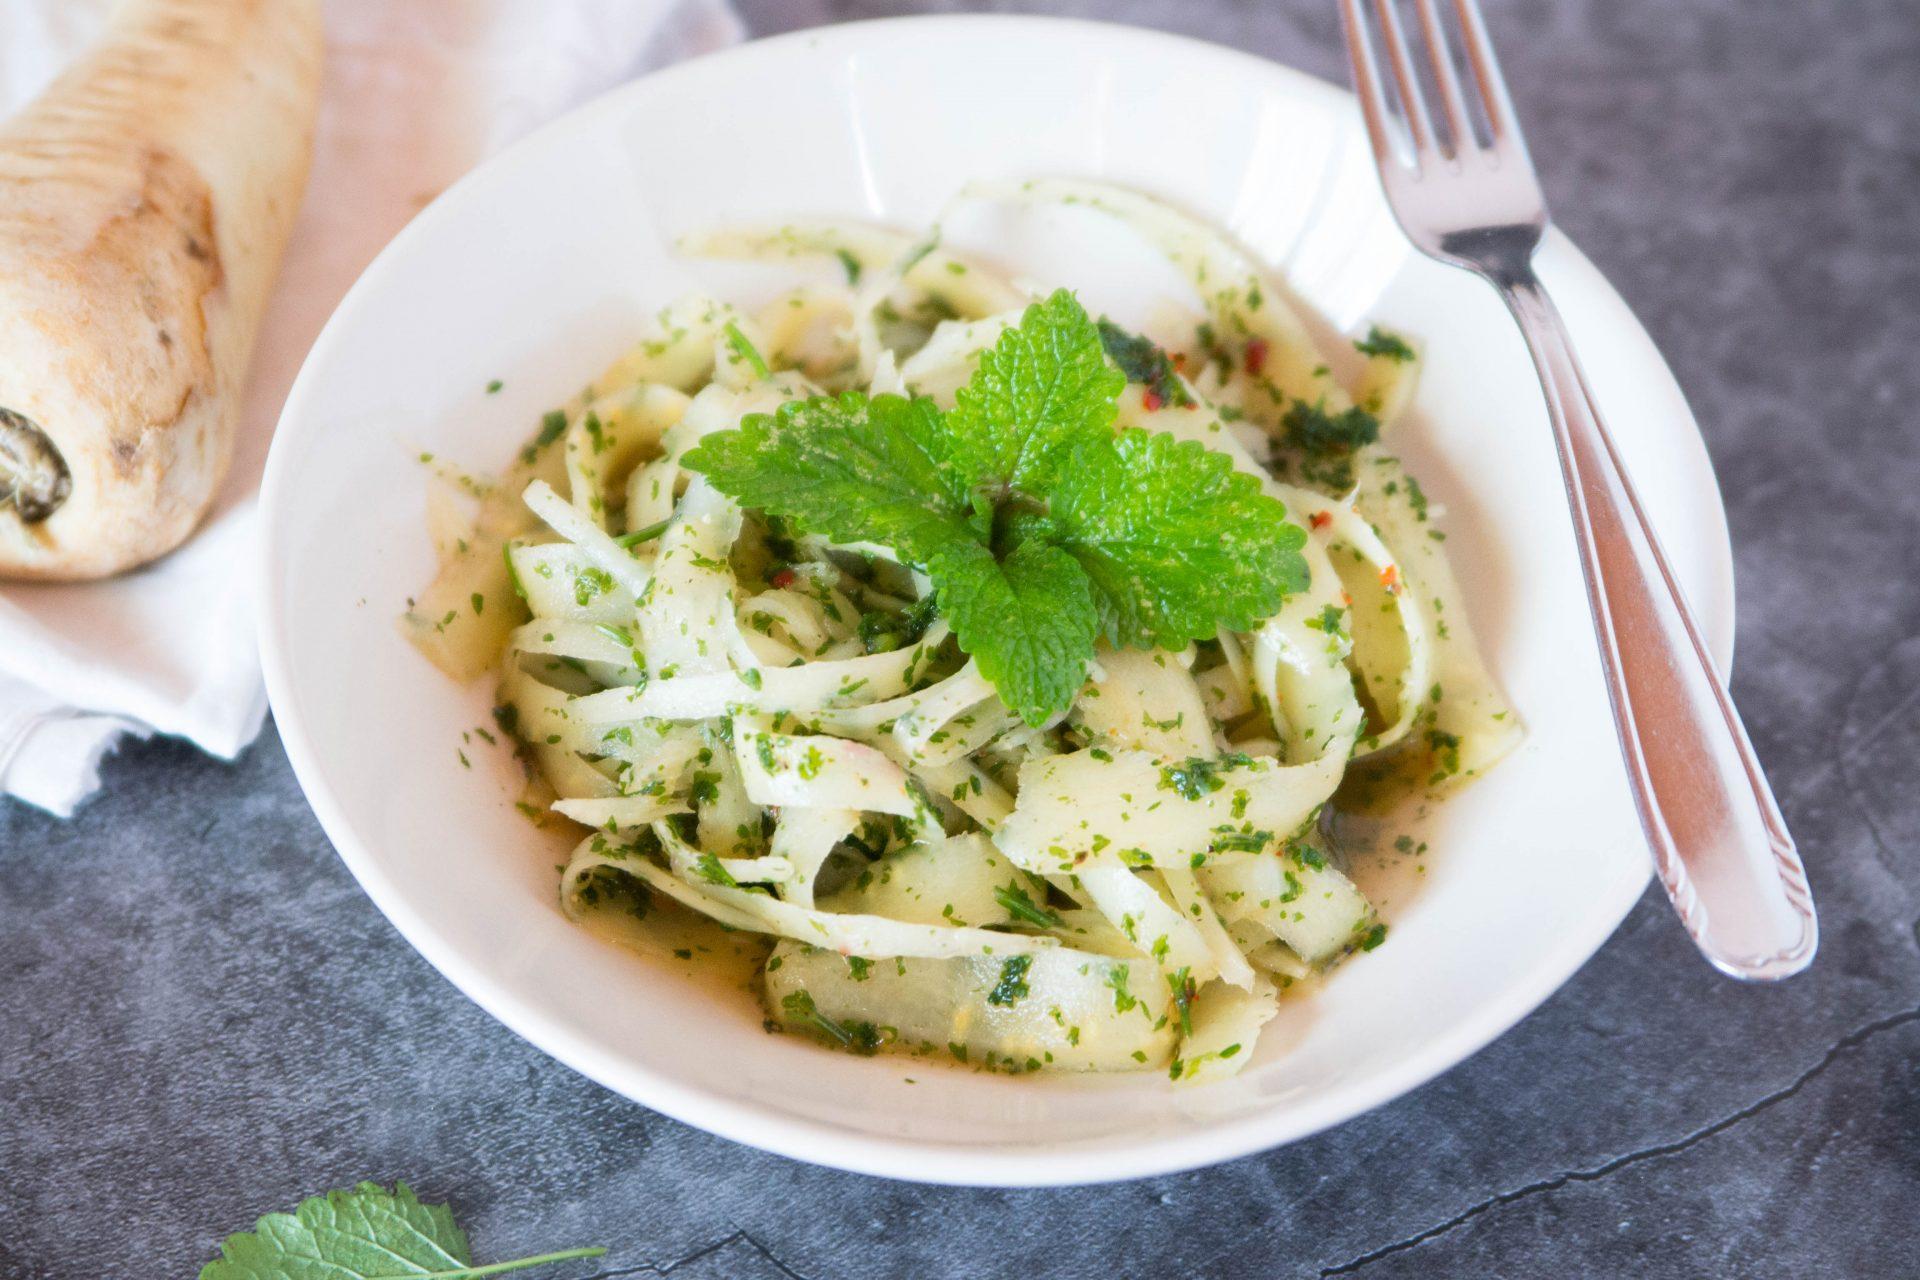 Pastinaken-Salat mit Zitronen-Chili-Marinade